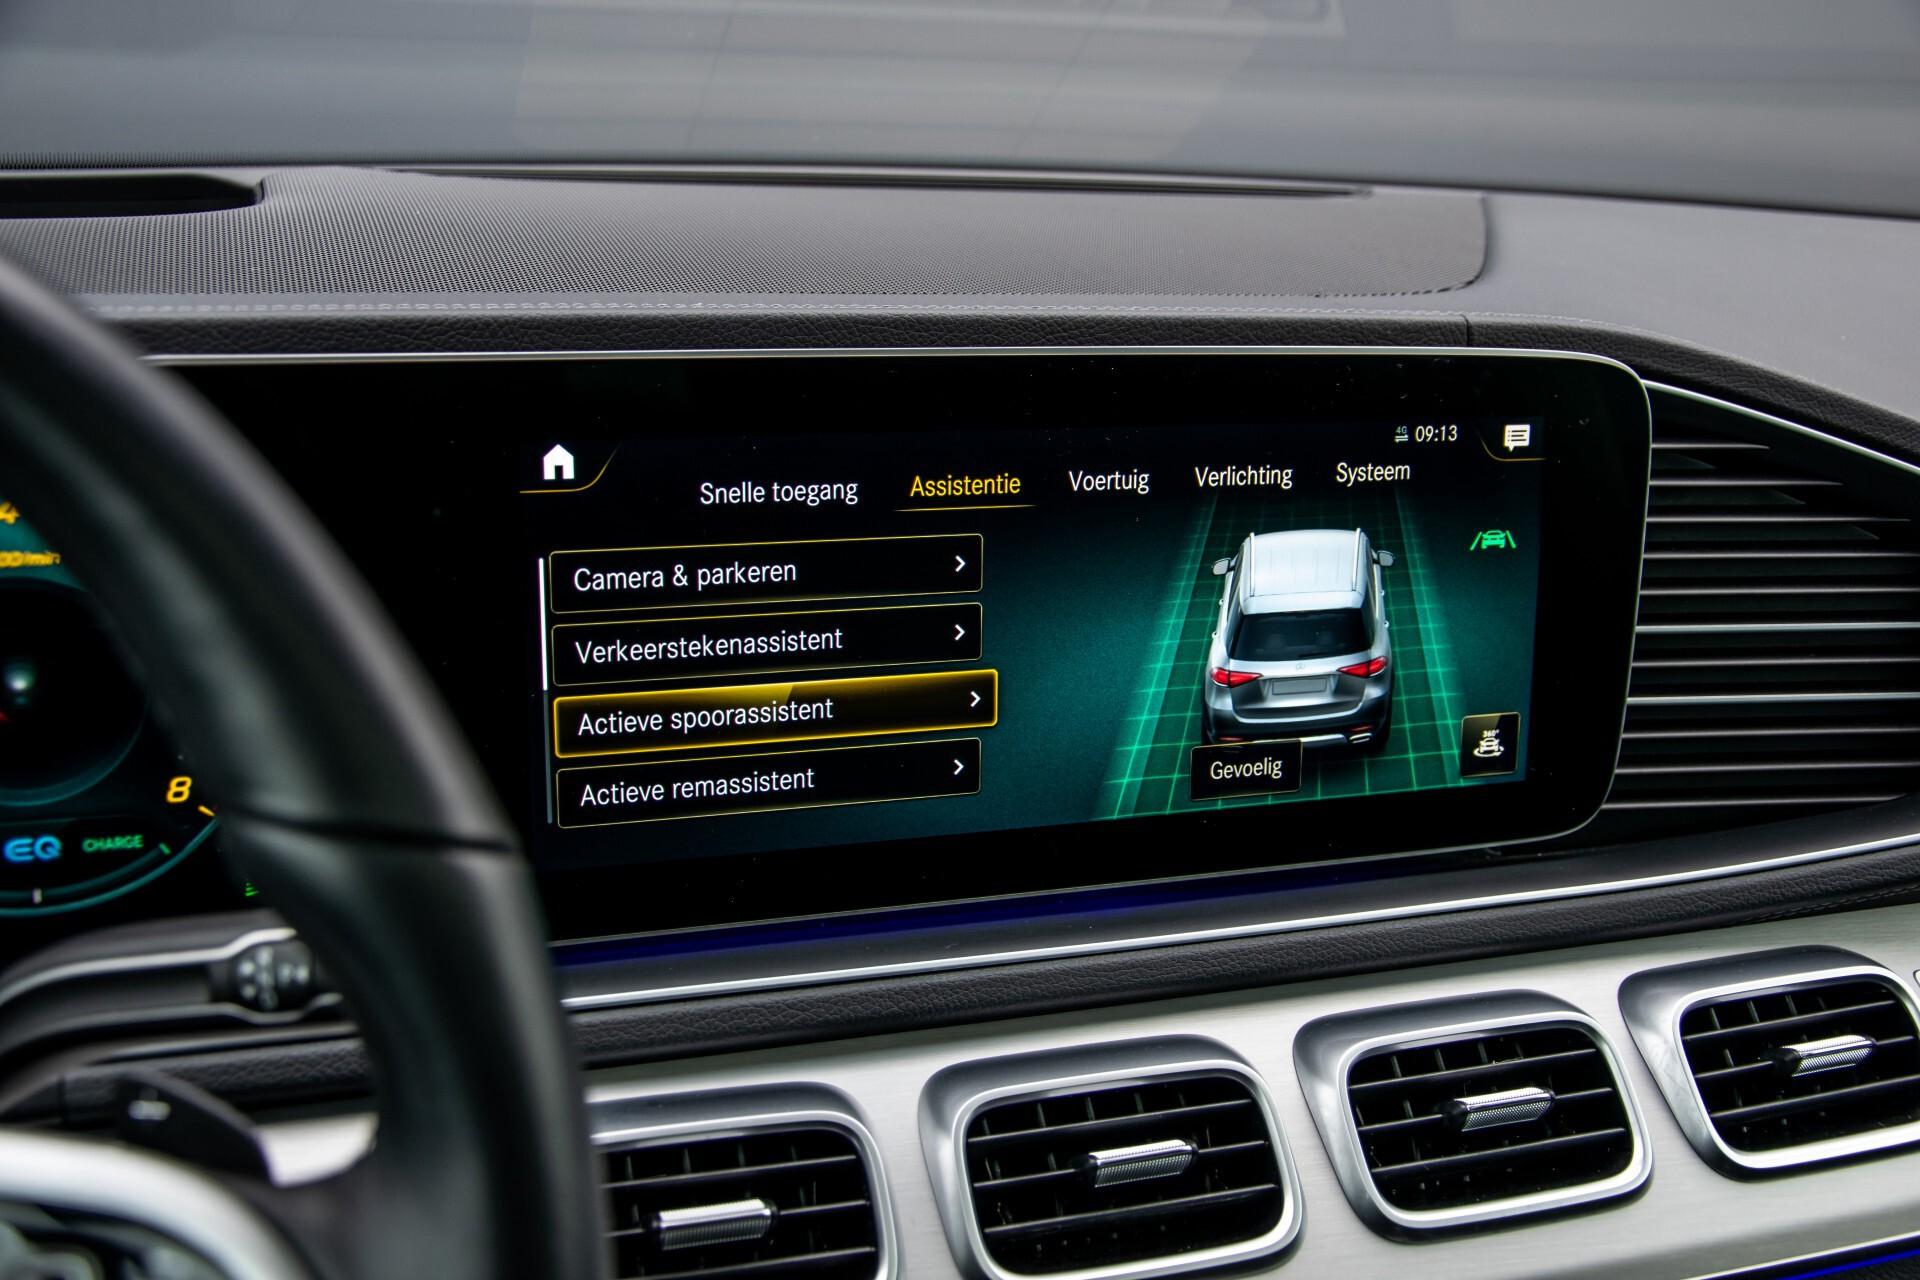 Mercedes-Benz GLE 450 4-M 7-Persoons AMG Massage/Rij-assist/Keyless/TV/360/Night/Trekhaak Aut9 Foto 32